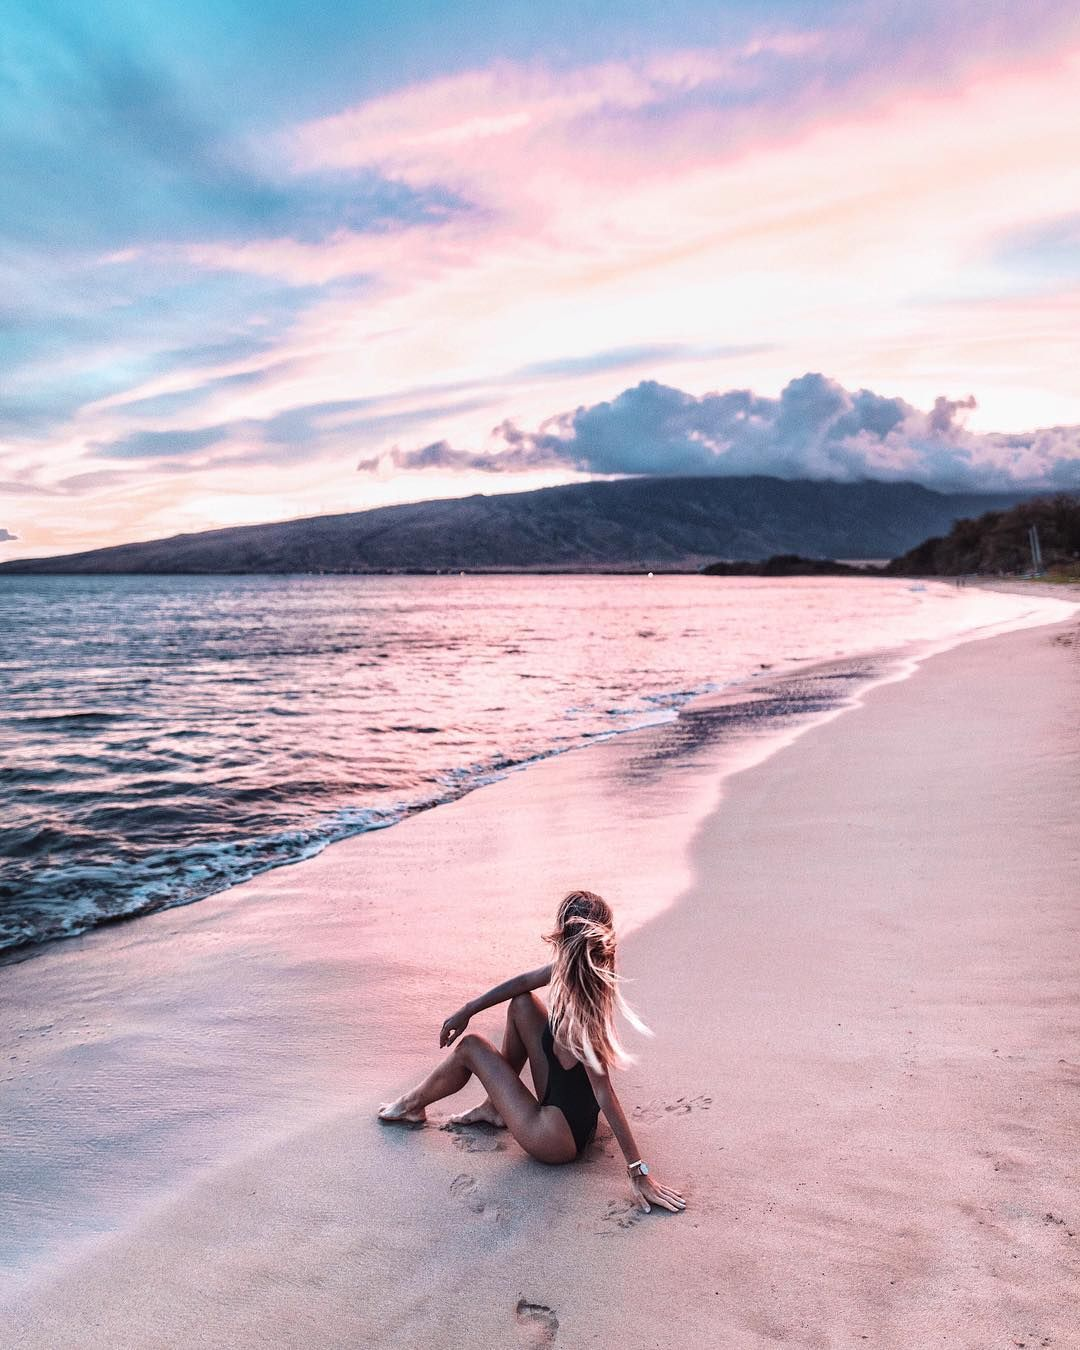 Erotica Sideboobs Debi Flugge  nudes (34 fotos), 2019, swimsuit